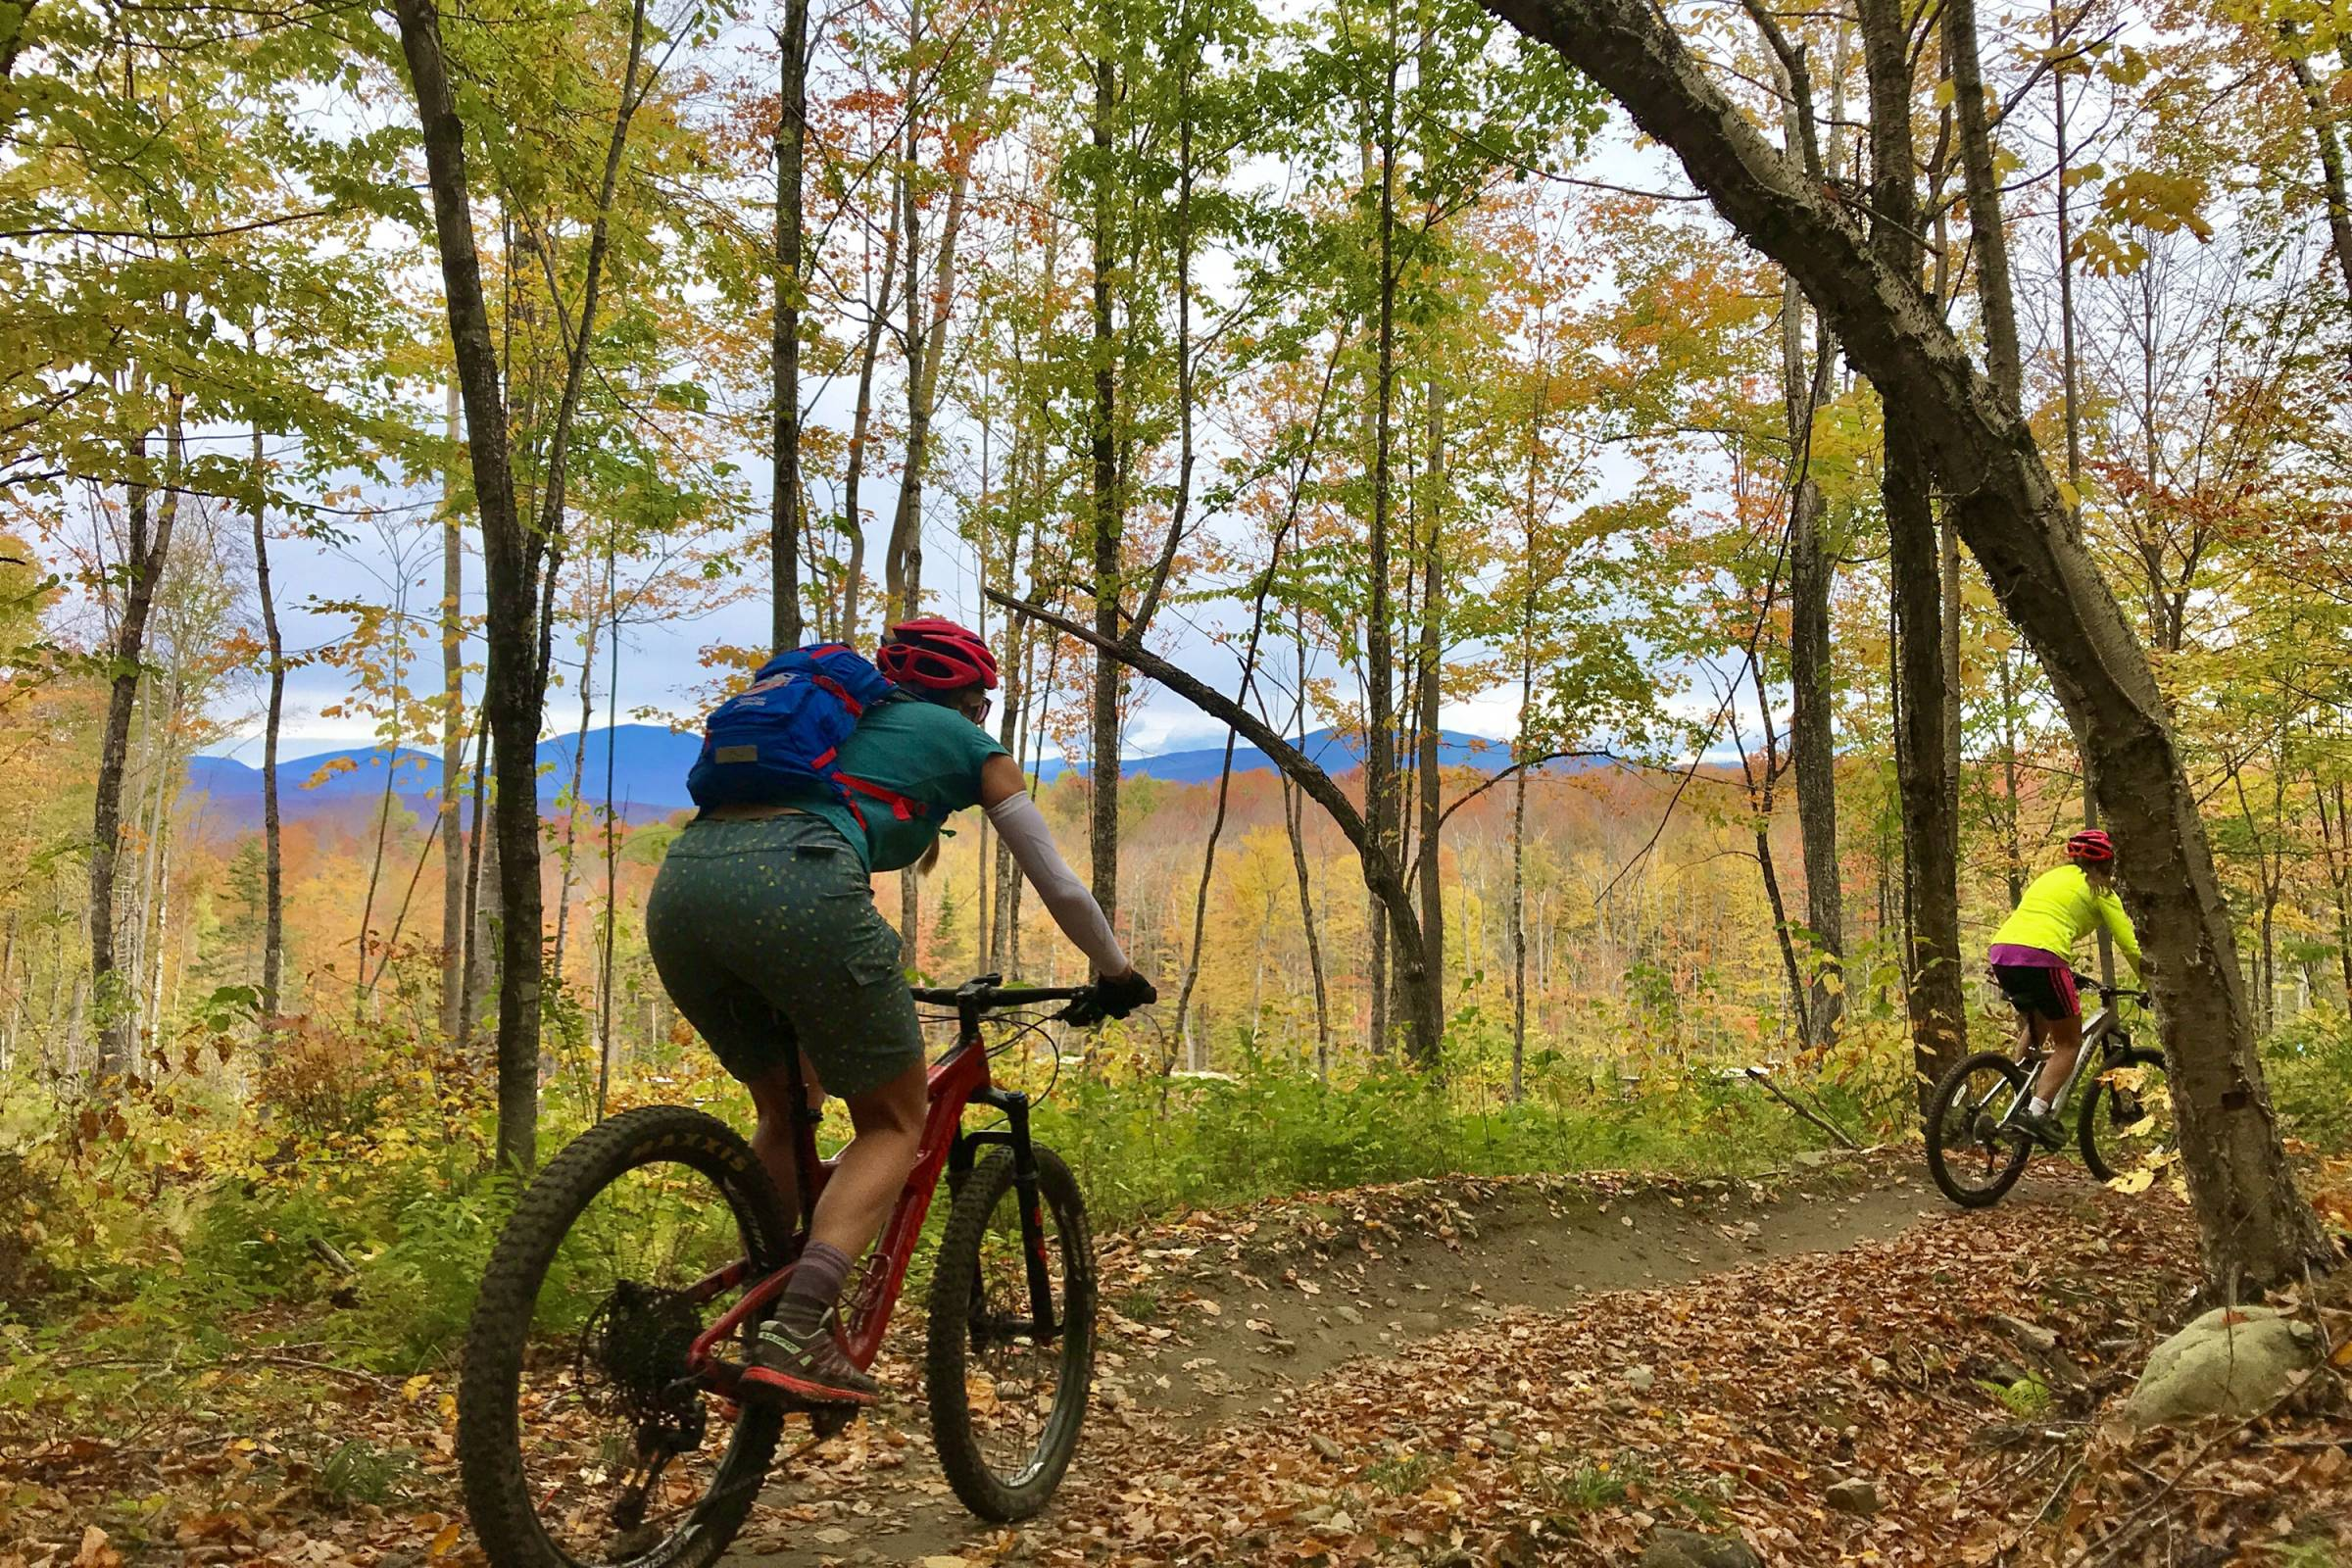 Mountain biking through forest